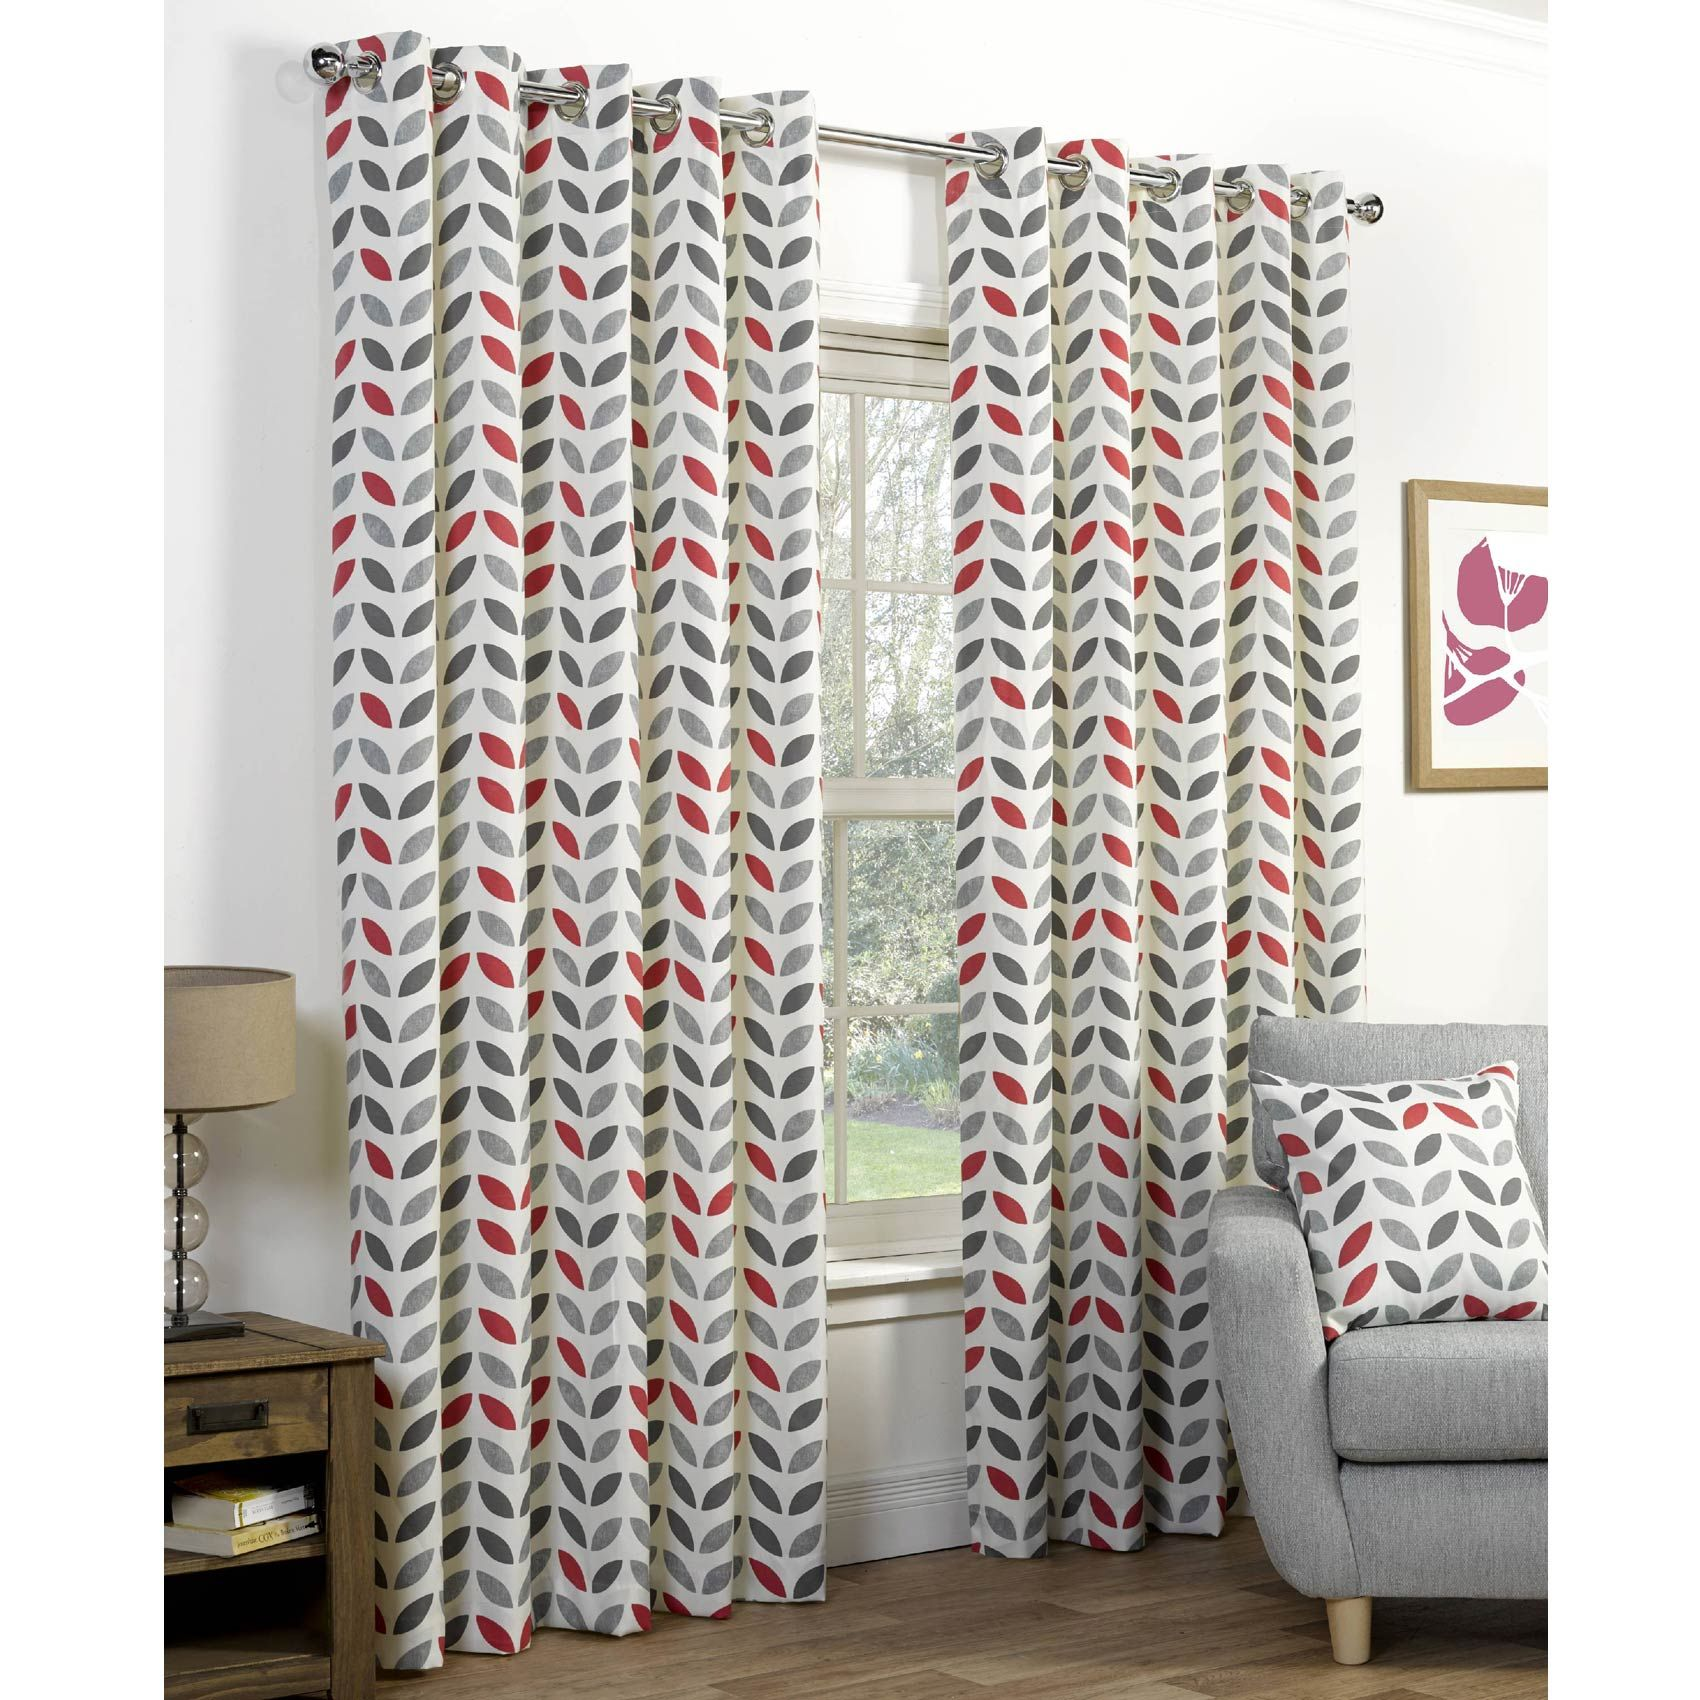 Neo Retro Eyelet Print Curtains, Grey / Red